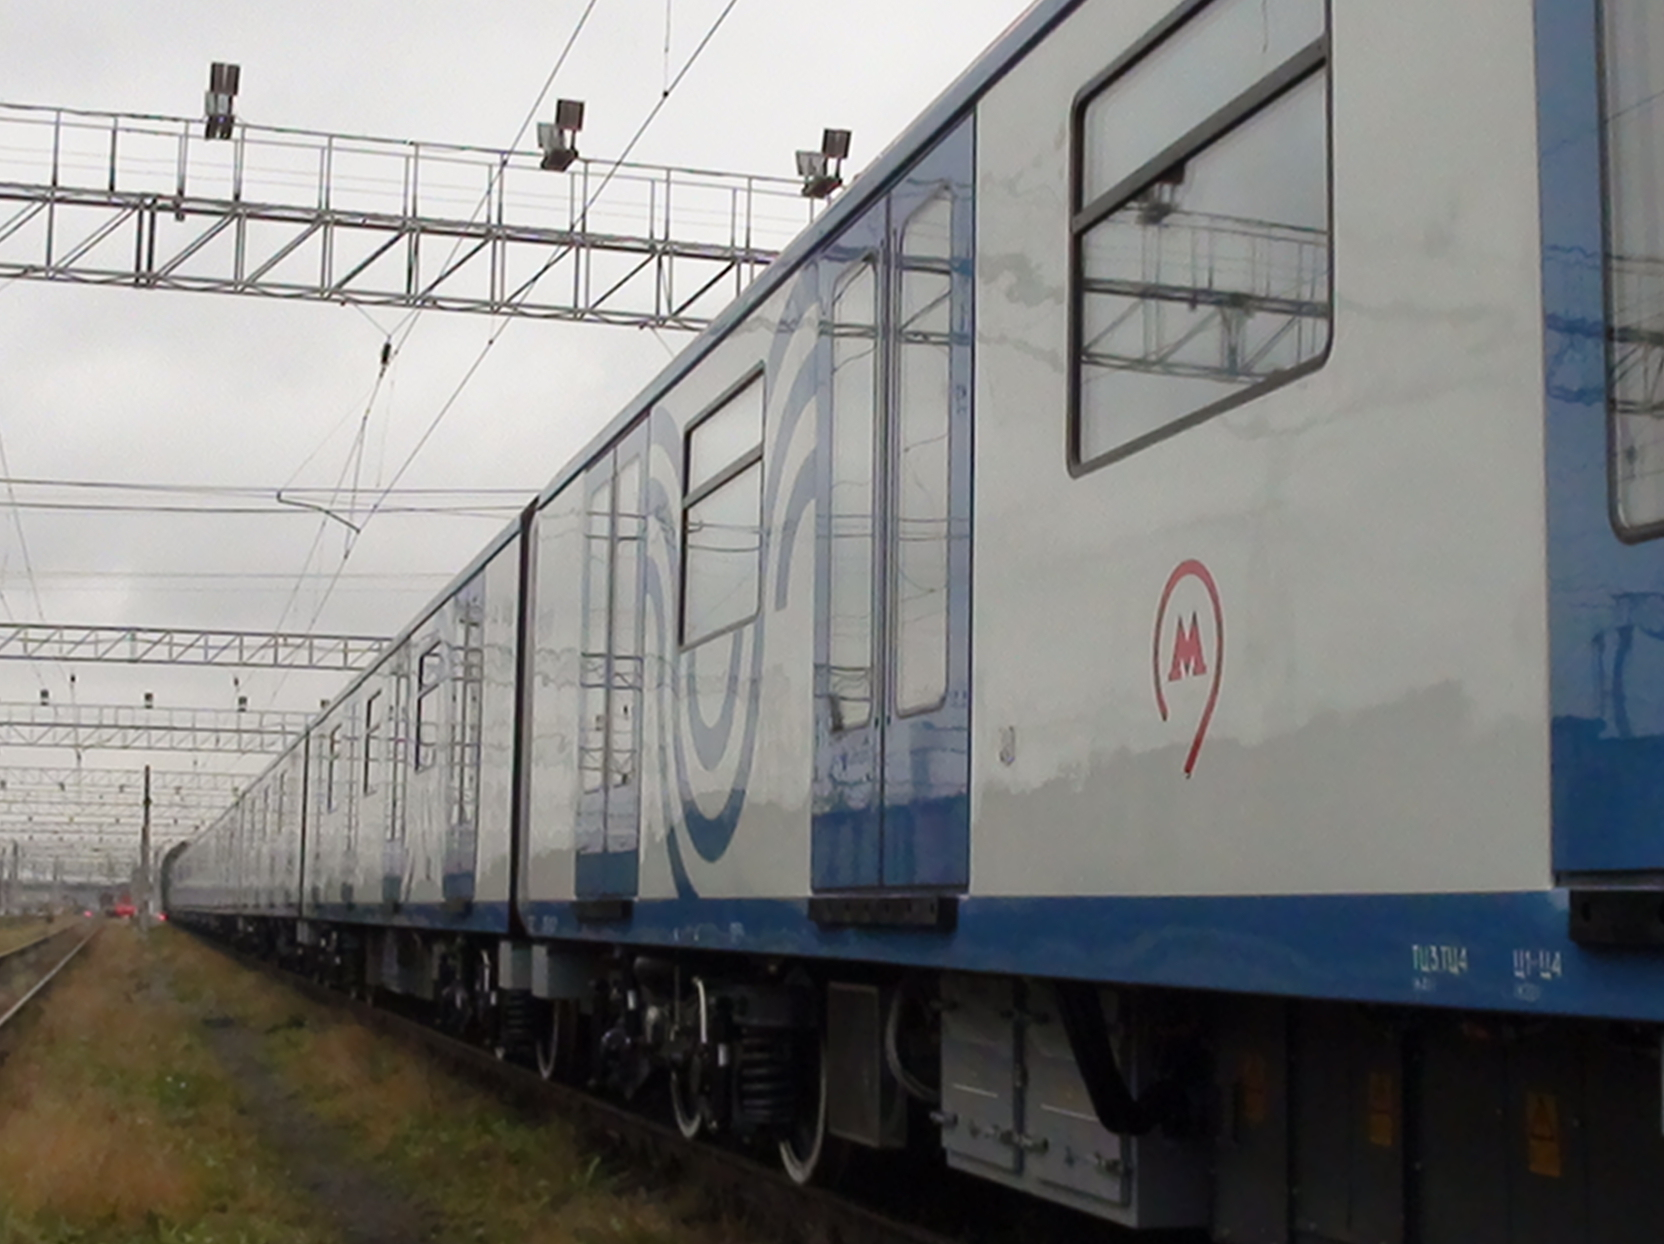 DSC08922.JPG